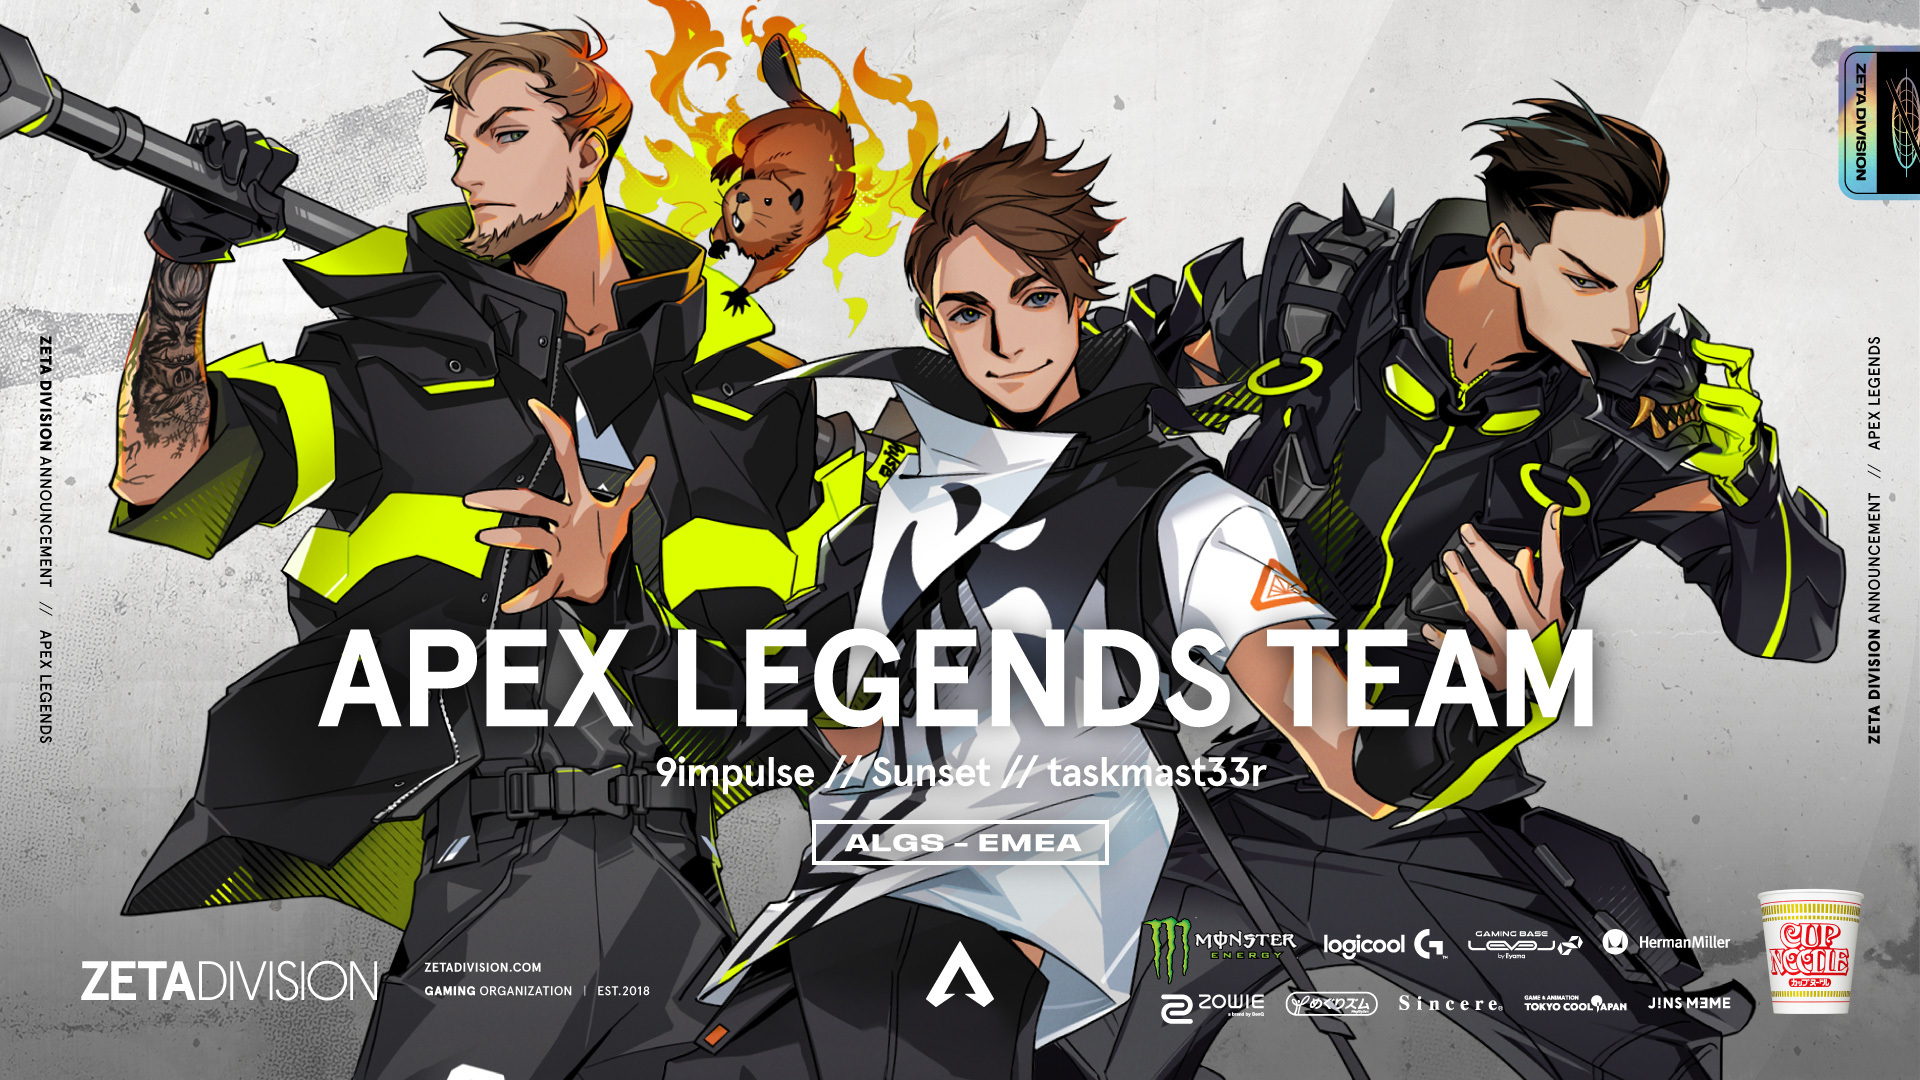 Apex Legends – 9impulse, Sunset, taskmast33r 加入のお知らせ / 9impulse, Sunset and taskmast33r have joined